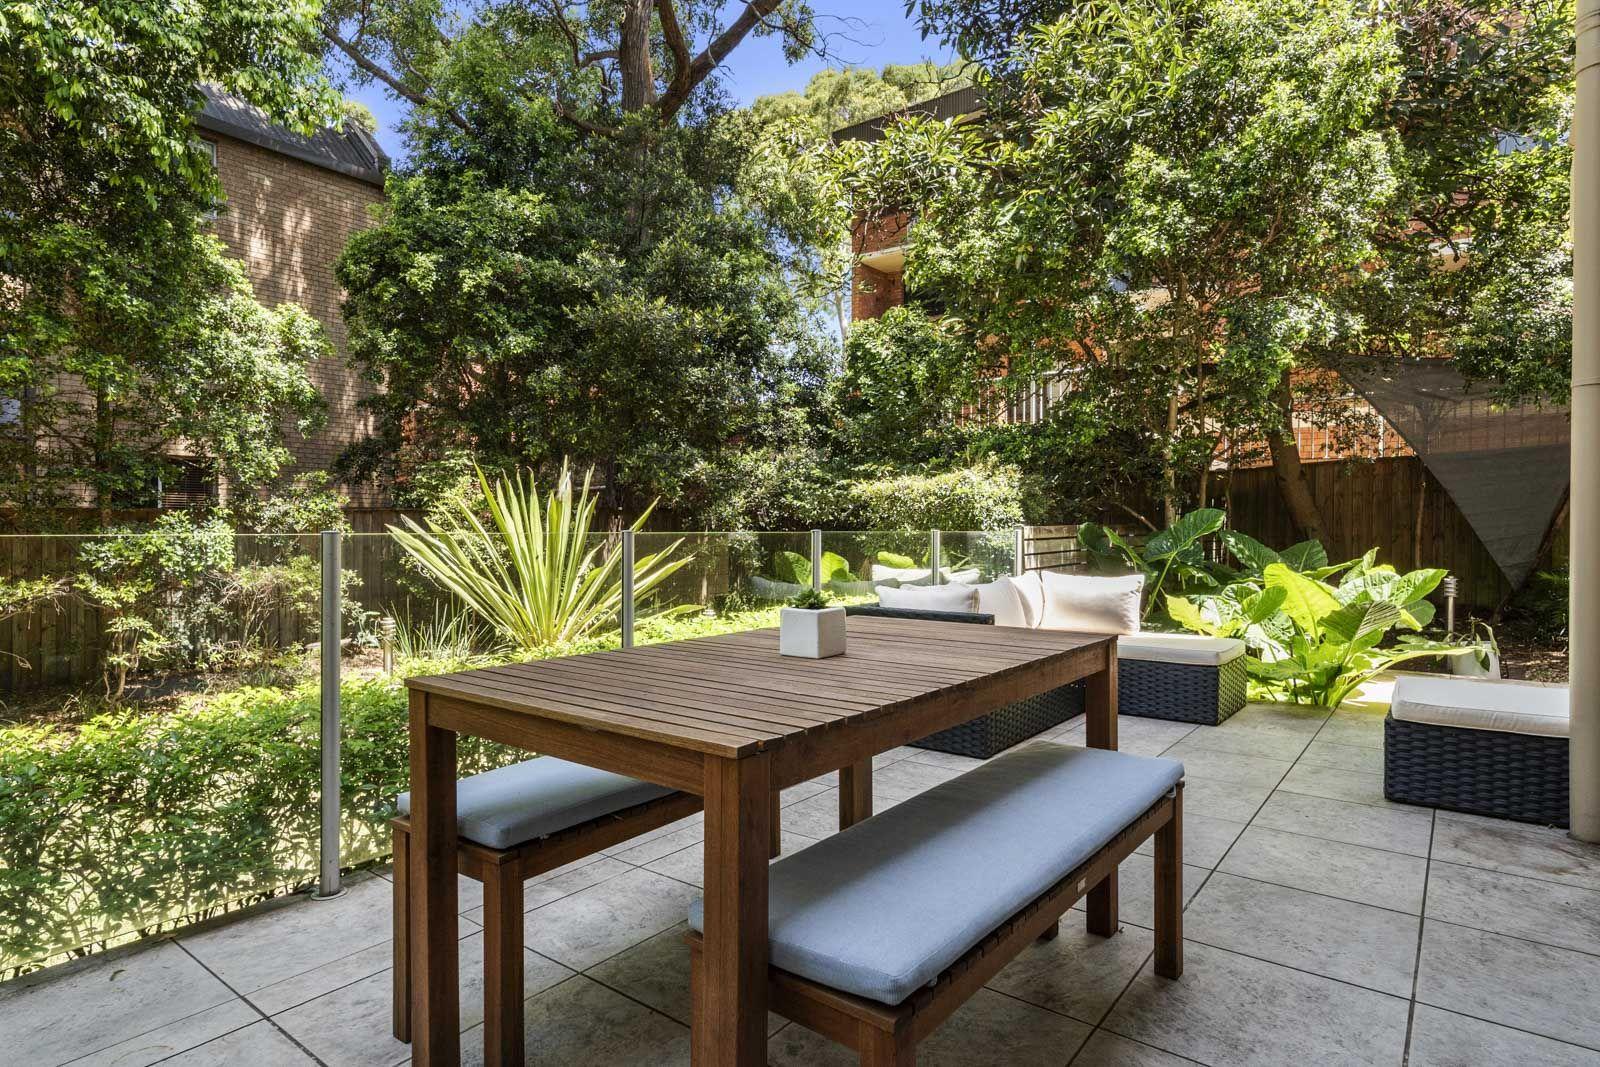 4/39 Roslaind Street, Cammeray NSW 2062, Image 0